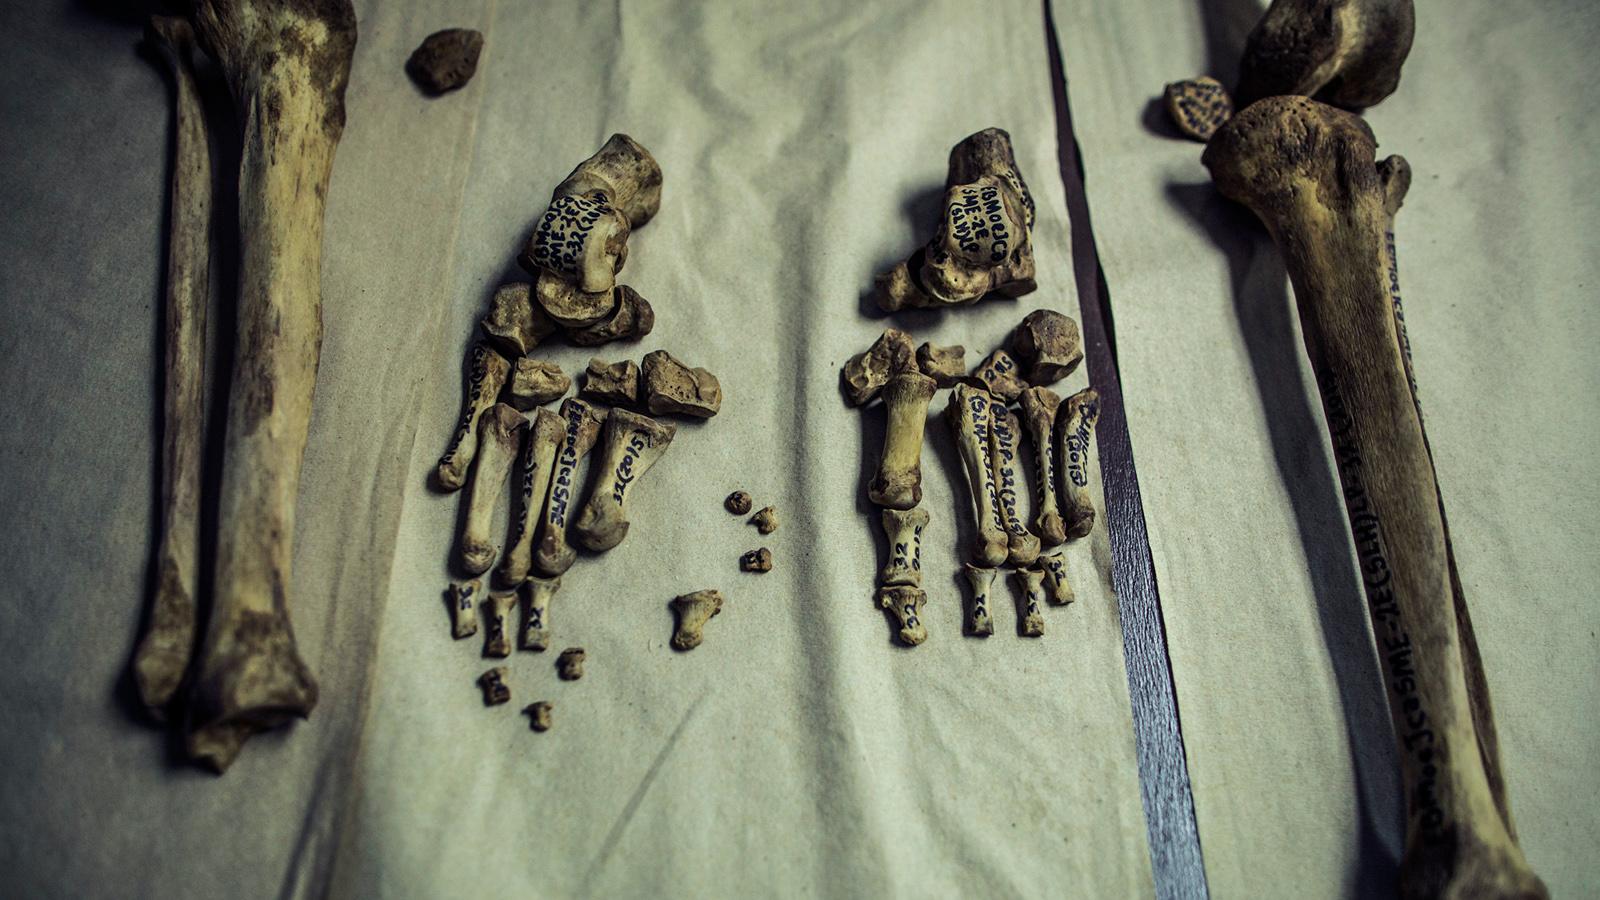 Bones unburied from a clandestine cemetery in the village of Zacatecoluca